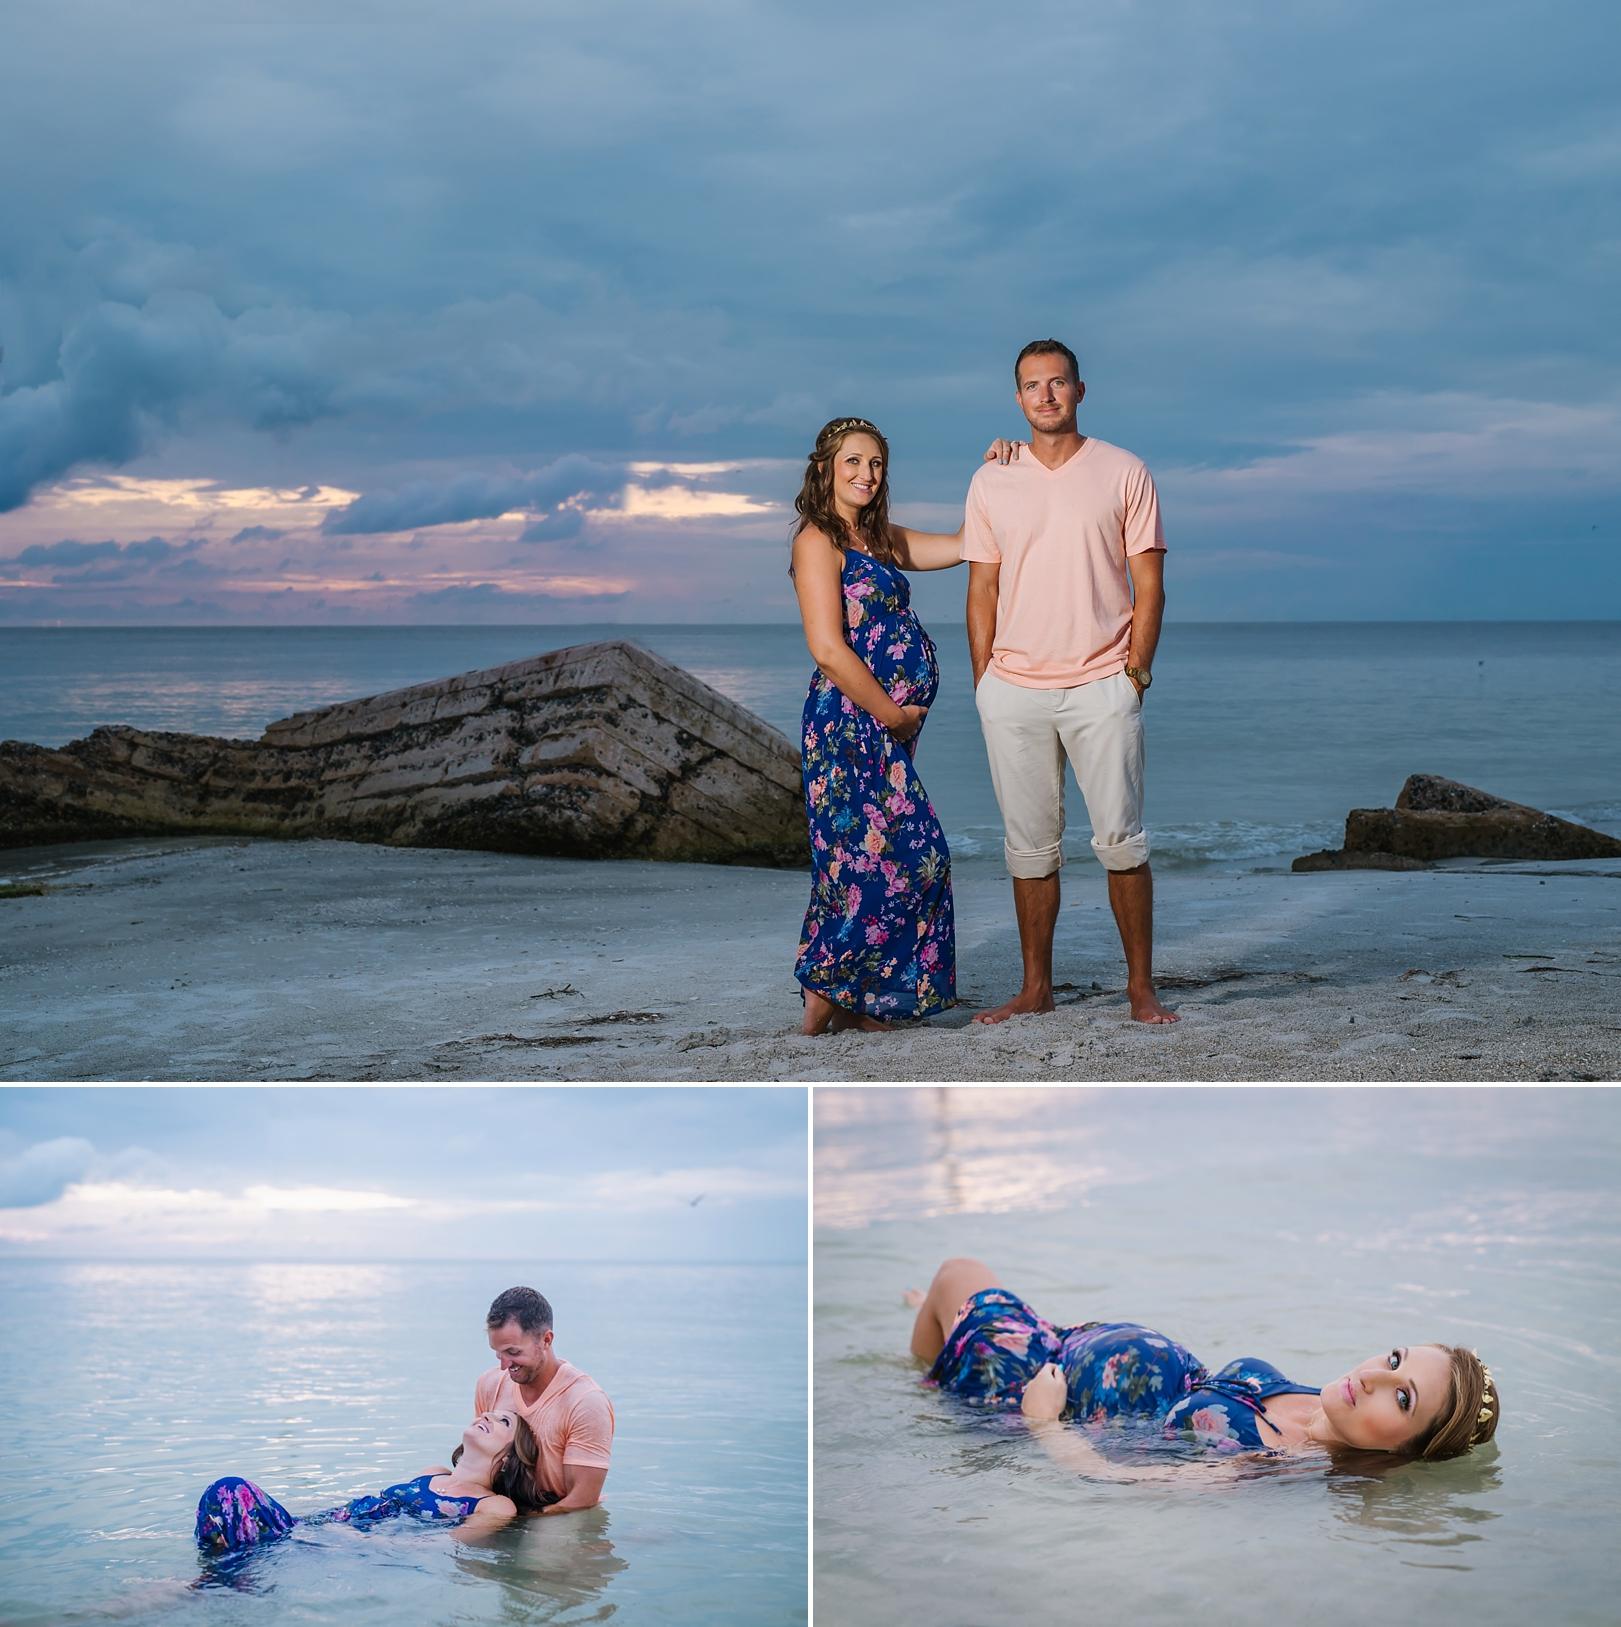 tampa-maternity-photography-ashlee-hamon-beach_0007.jpg